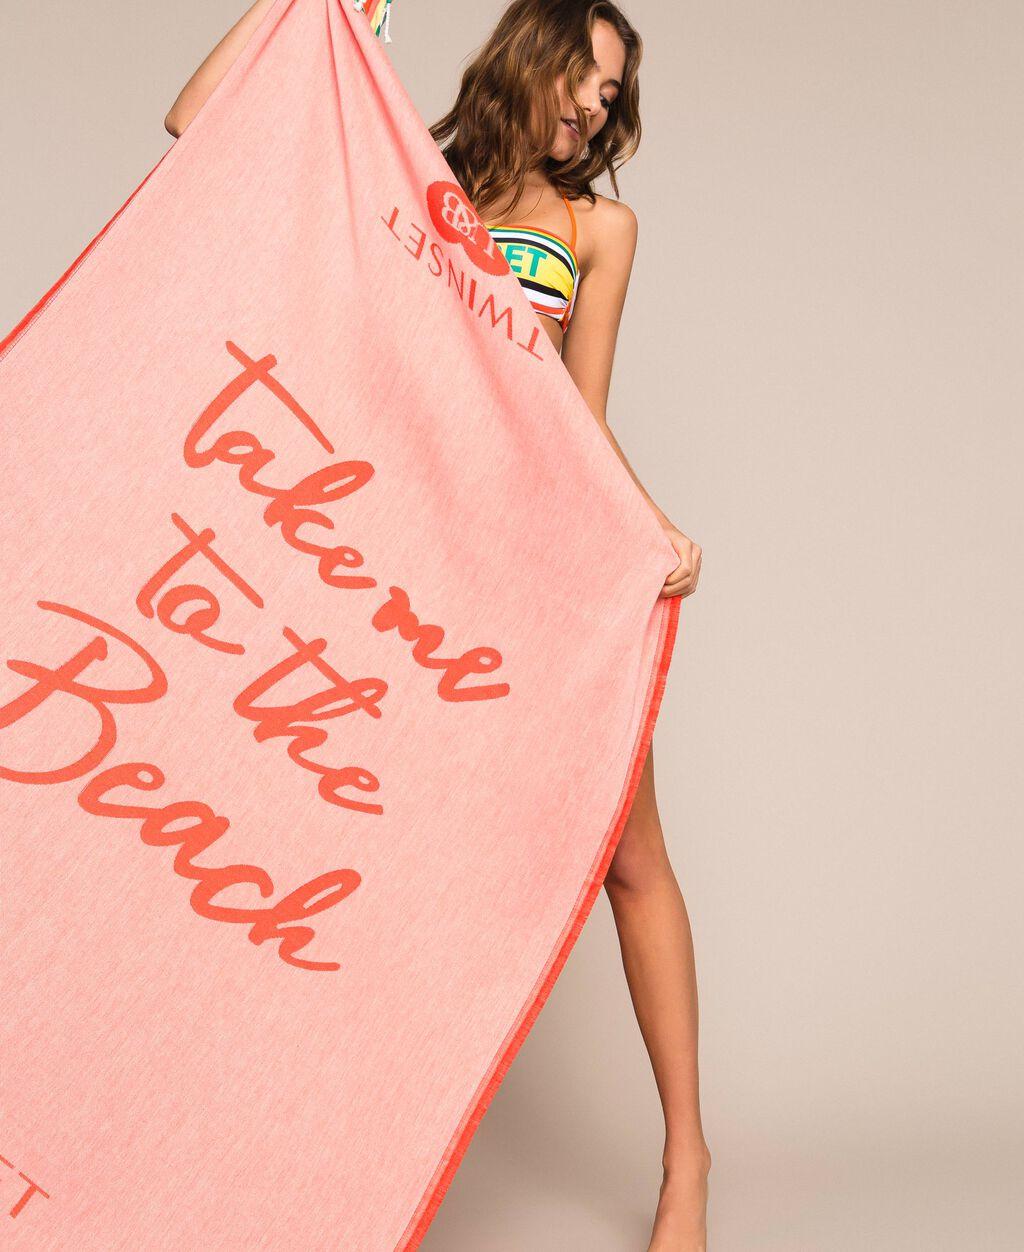 Jacquard beach towel with stripes